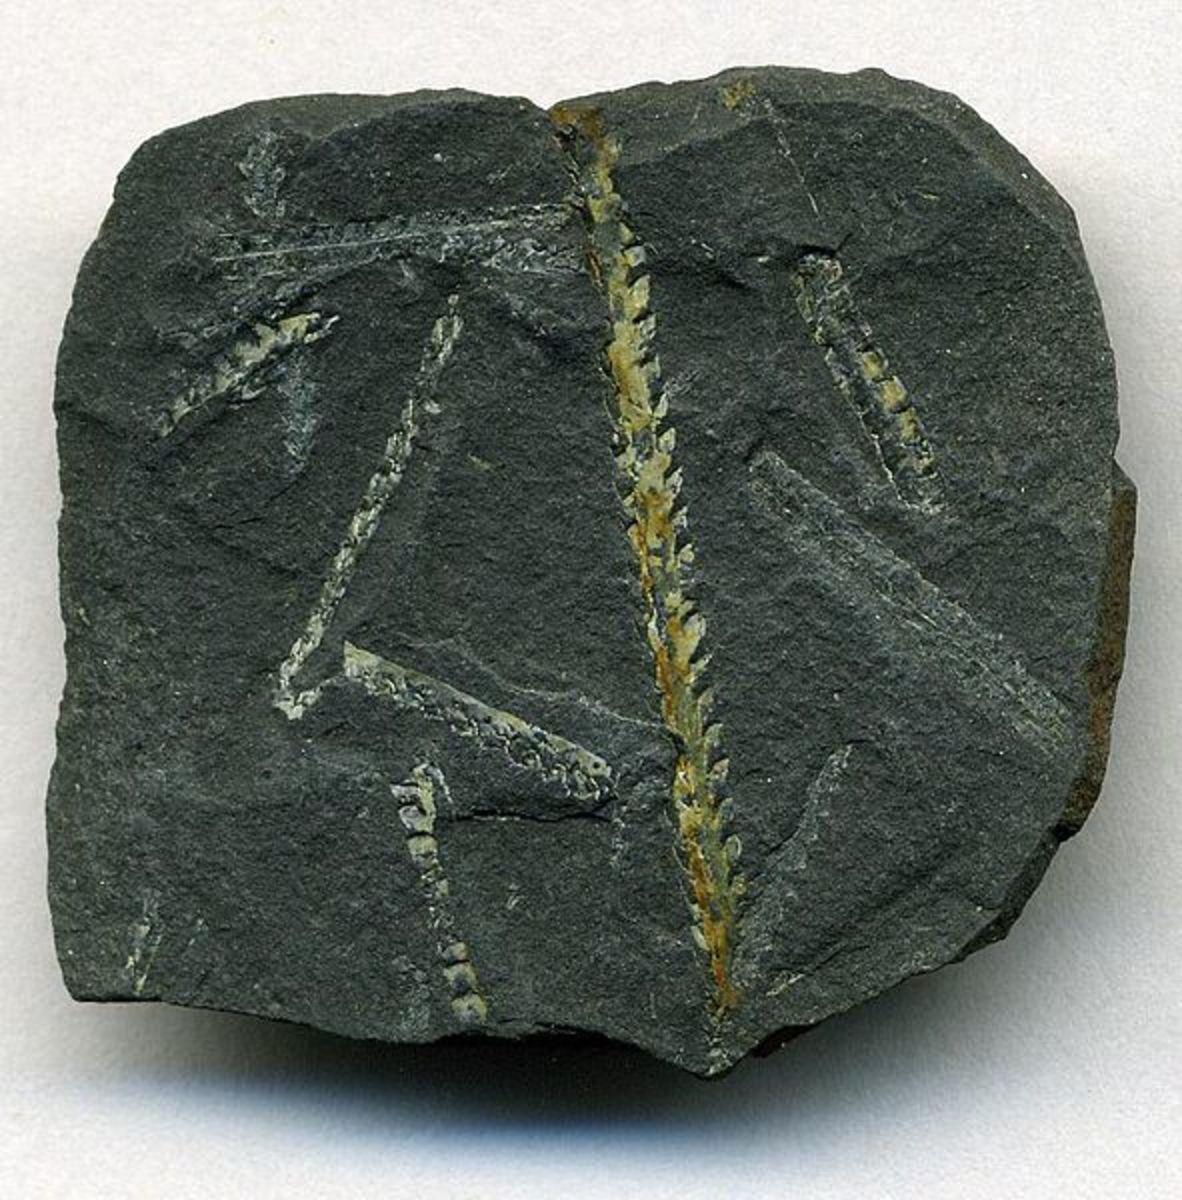 Graptolite fossils from Dobb's Linn.  Image courtesy Wikimedia Commons.